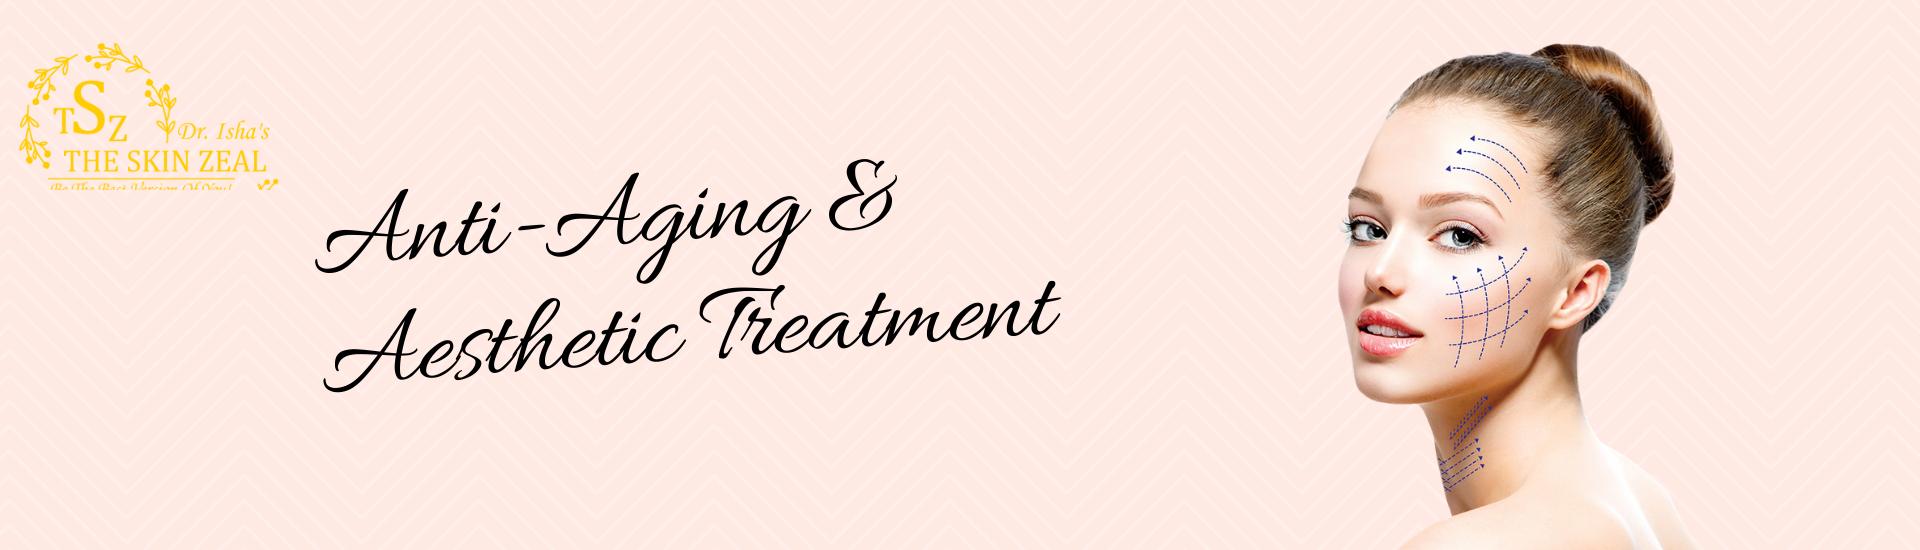 Anti-Aging & Aesthetic Treatment